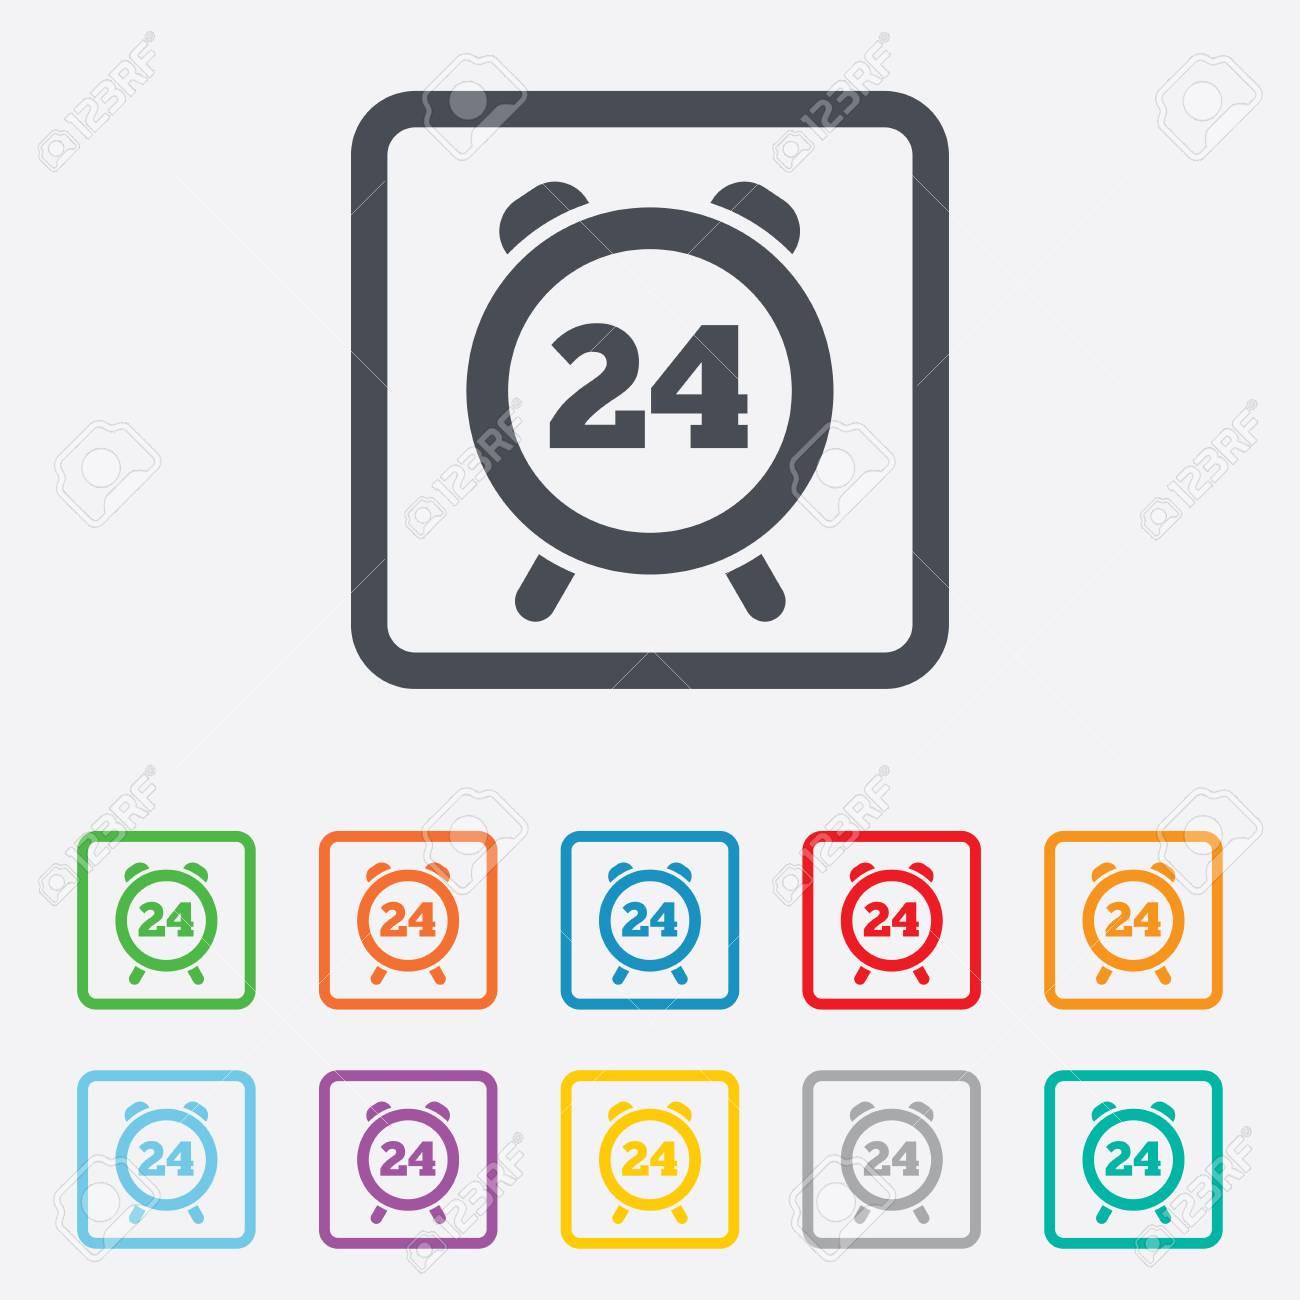 24 Horas Icono De Signo Momento. Símbolo De La Alarma Del Reloj ...